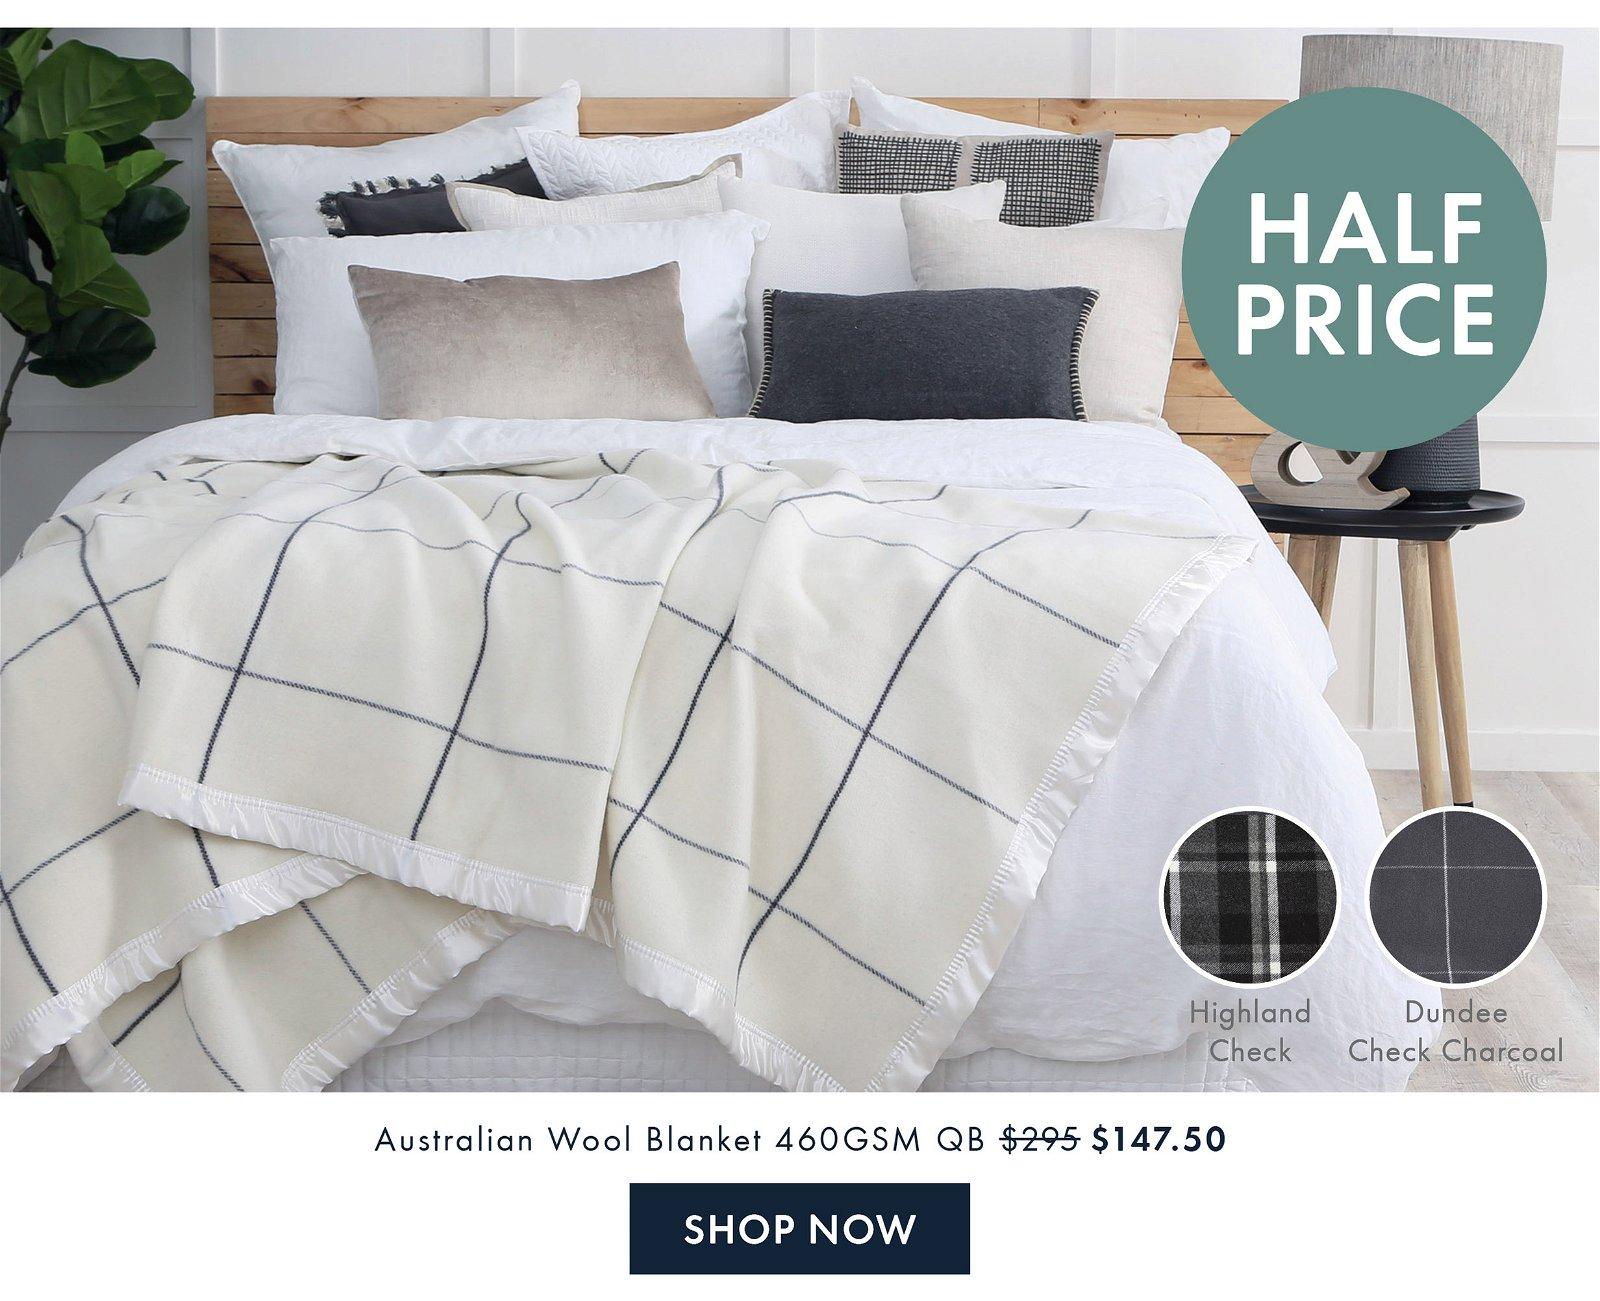 Half Price | Australian Wool Blanket QB $147.50 | Shop Now